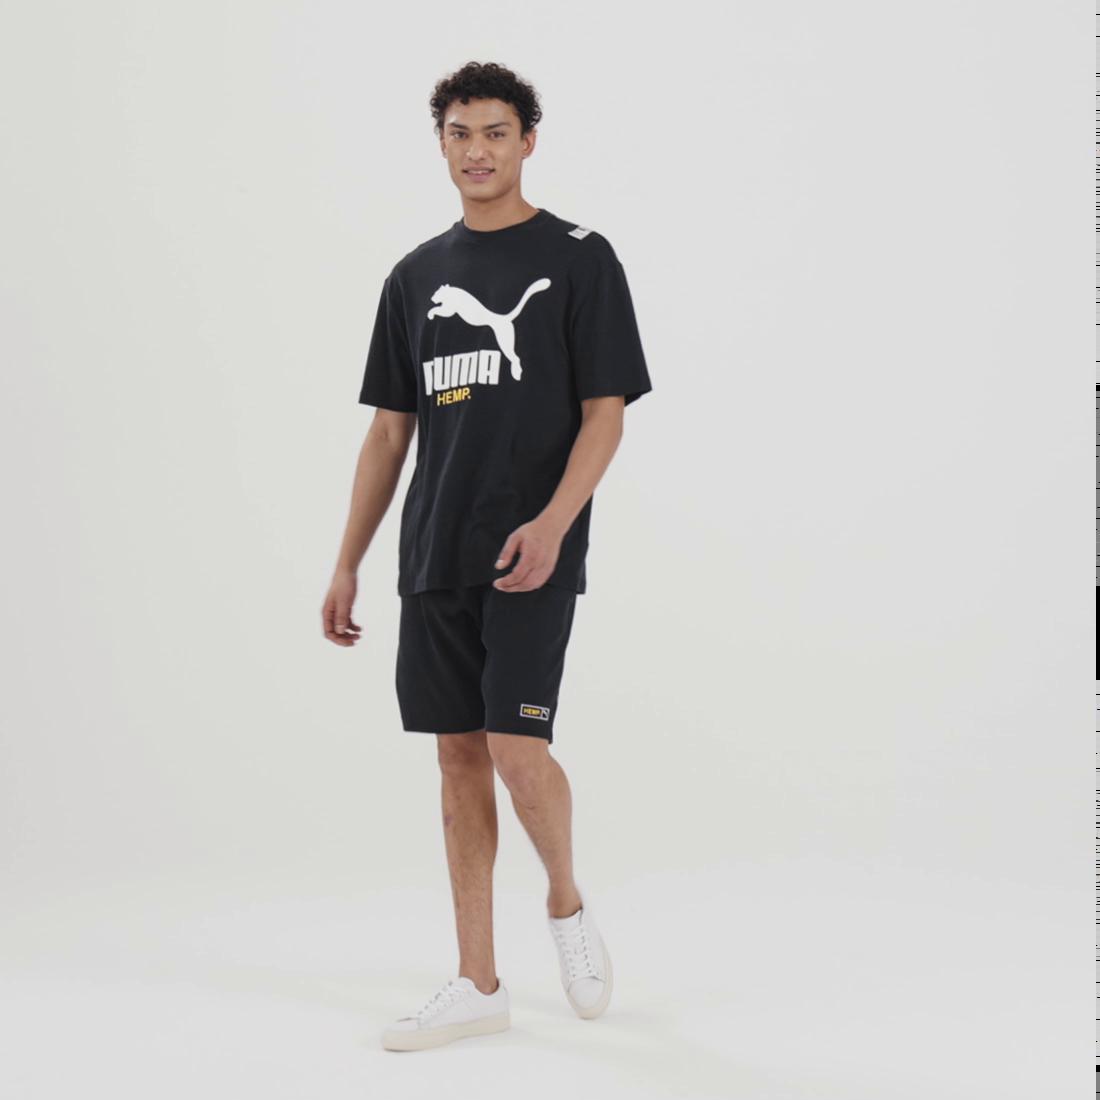 Image PUMA Camiseta Hemp Masculina #6